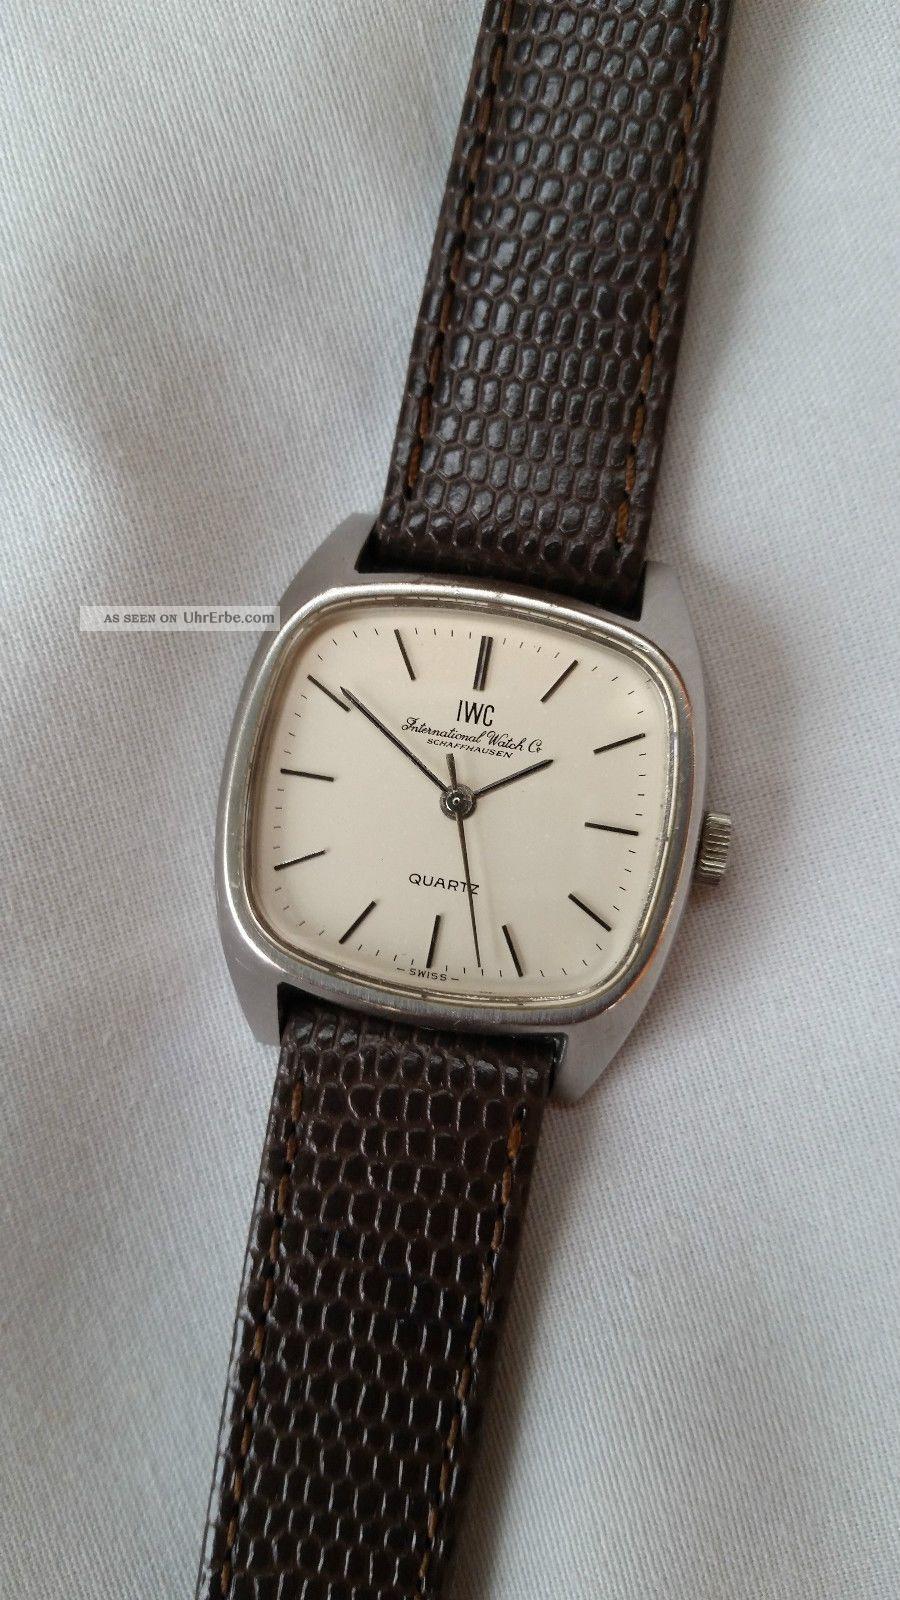 Iwc Edelstahl Quartz Damen Klassisch Schön Ca.  1980er Jahre Armbanduhren Bild